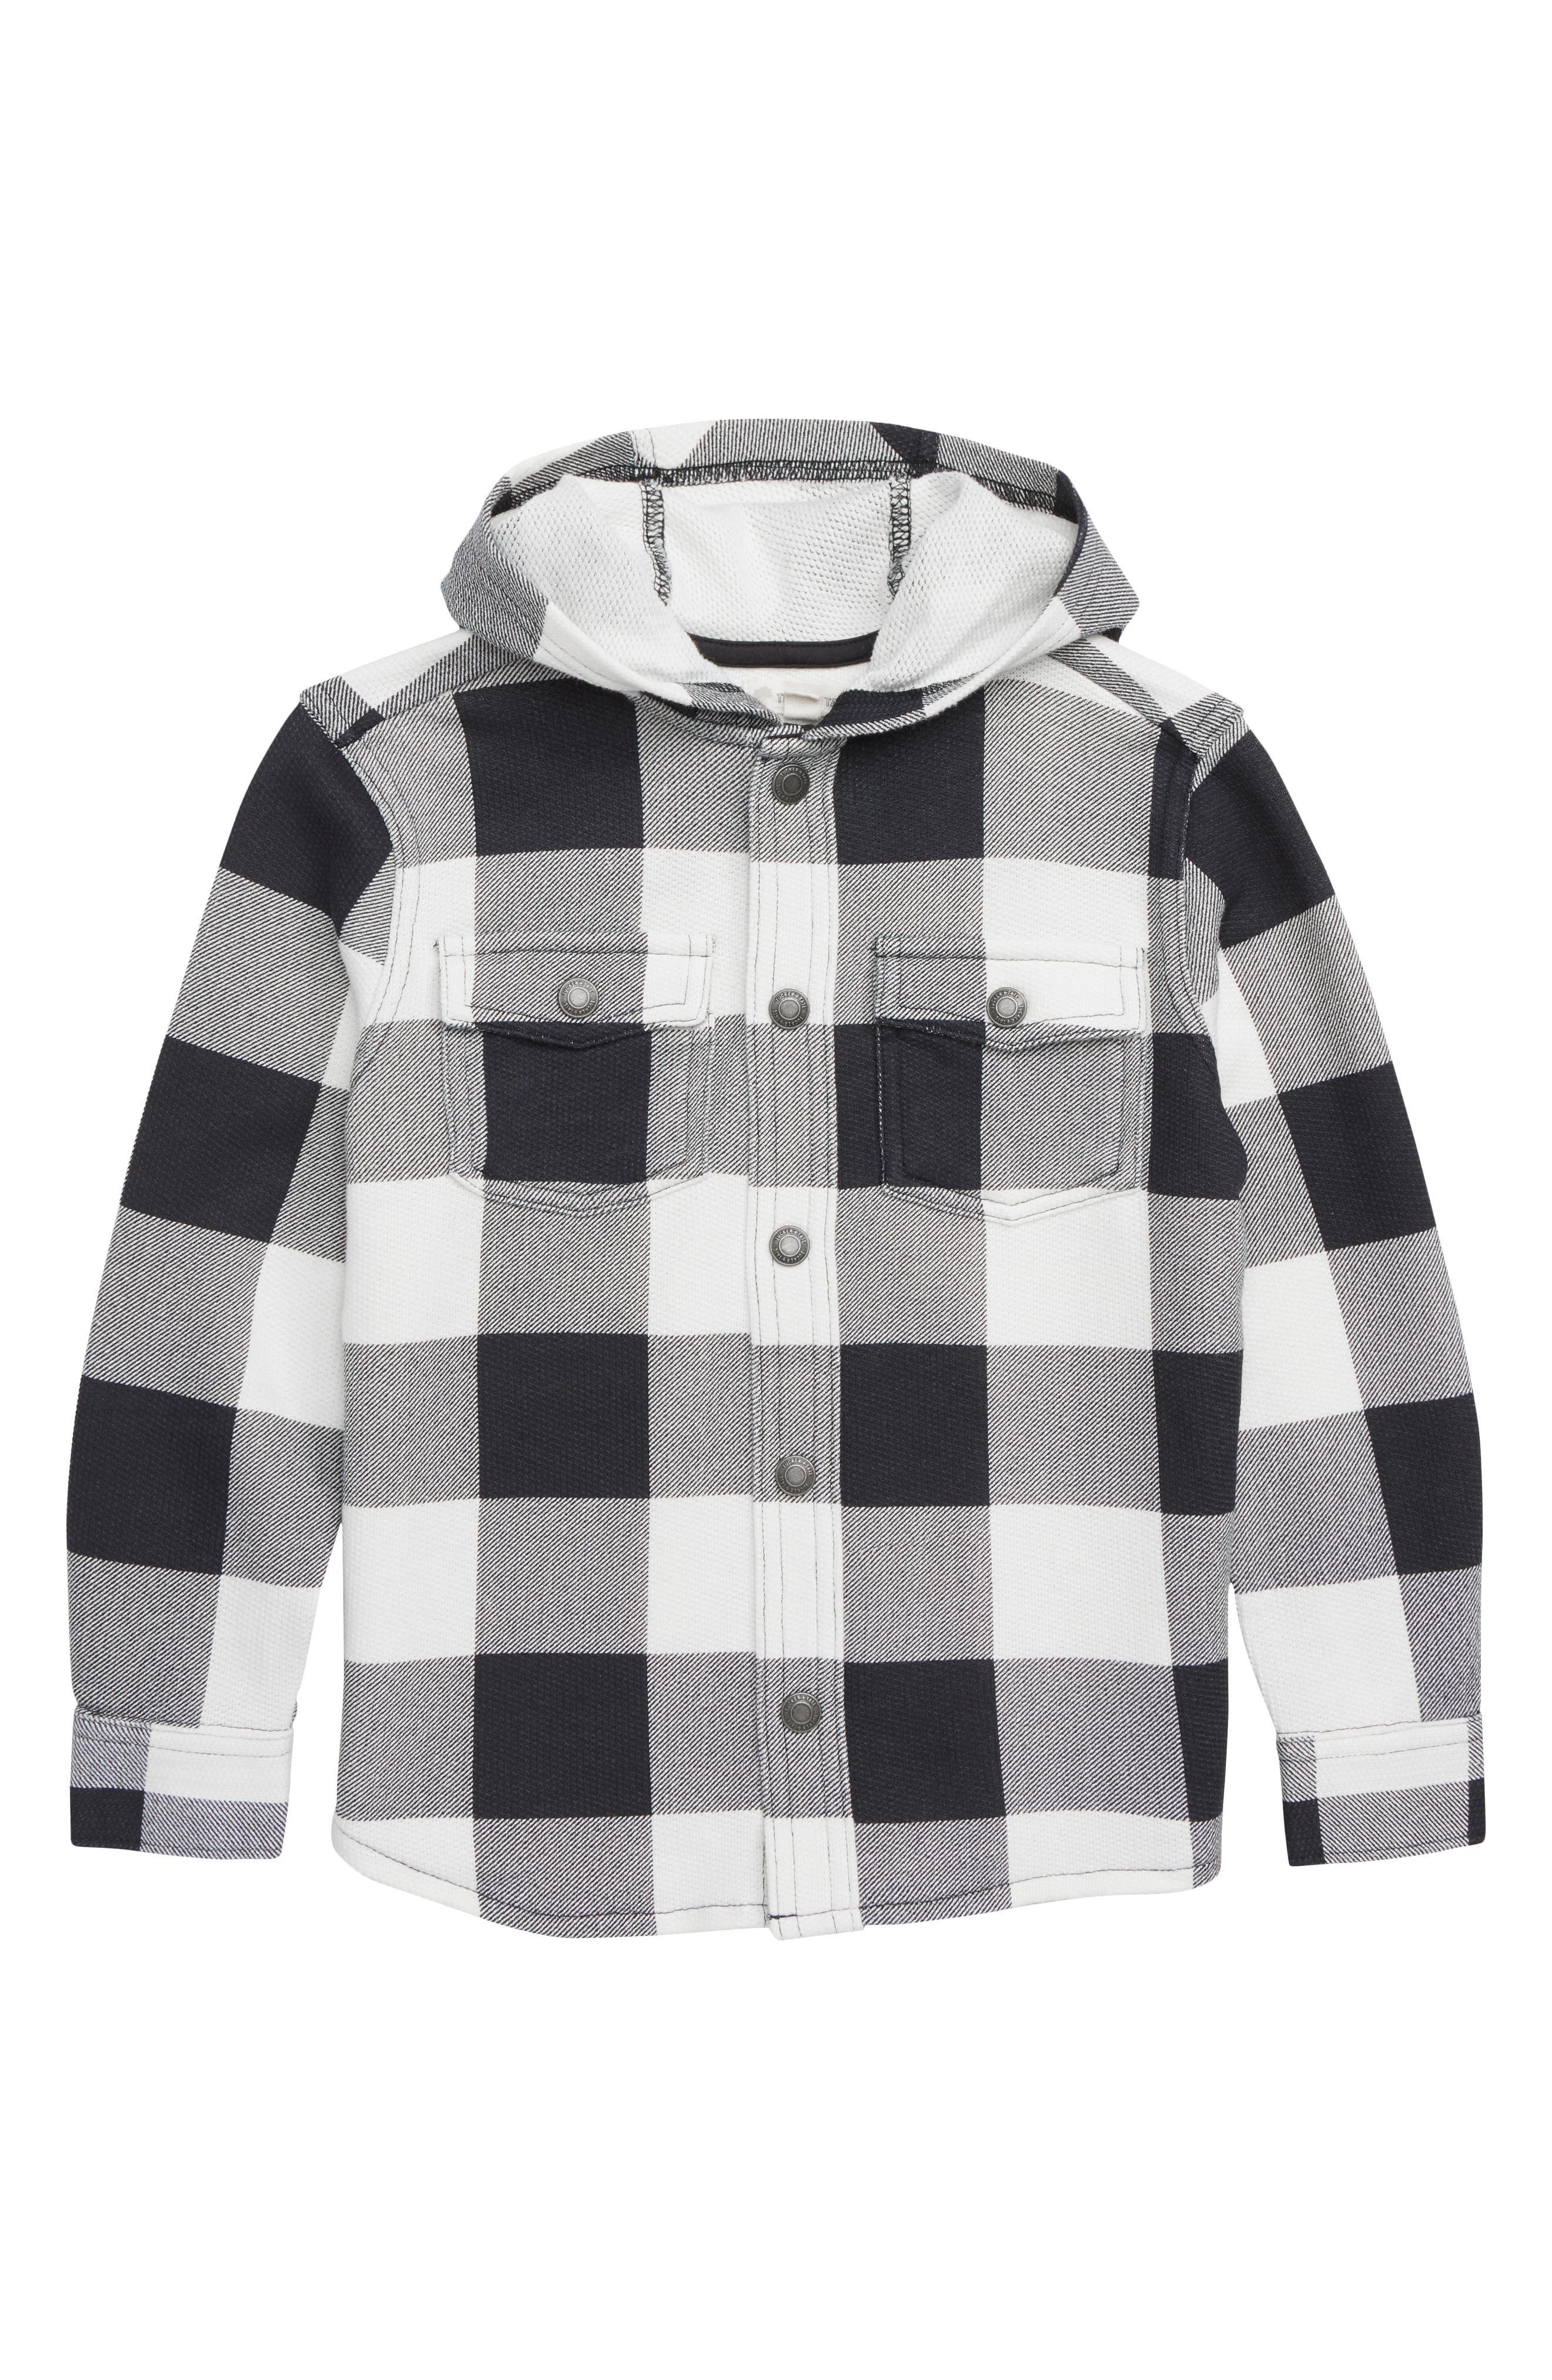 Buffalo Check Hooded Shirt,                         Main,                         color, WHITE- BLACK GINGHAM